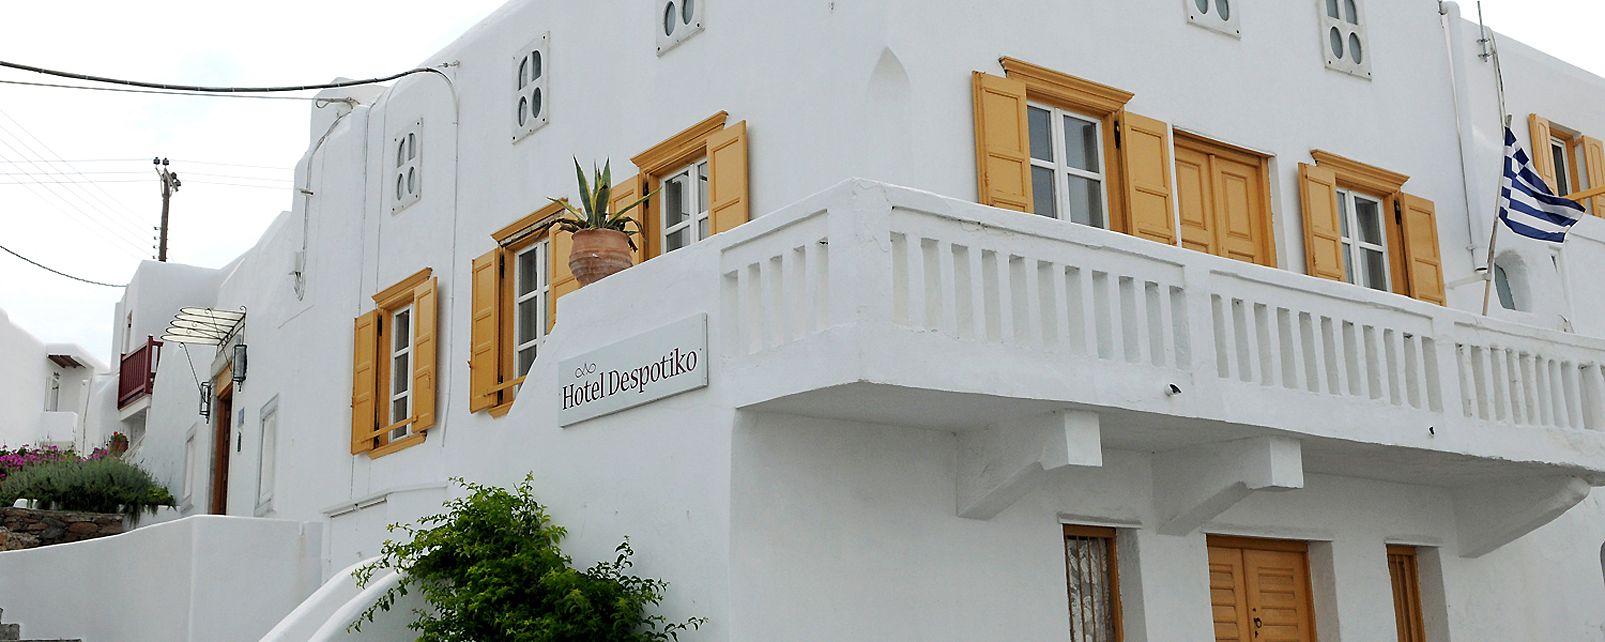 Hotel Despotiko